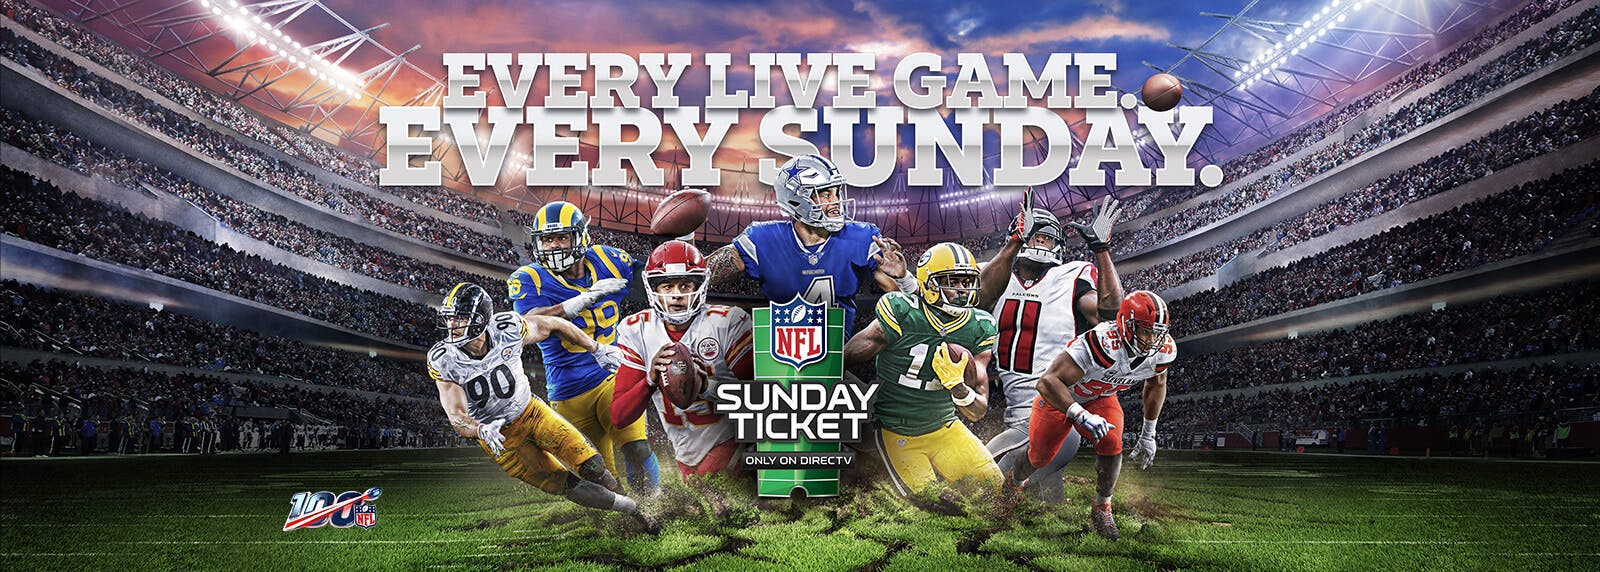 watch seahawks vs browns live stream nfl sunday ticket